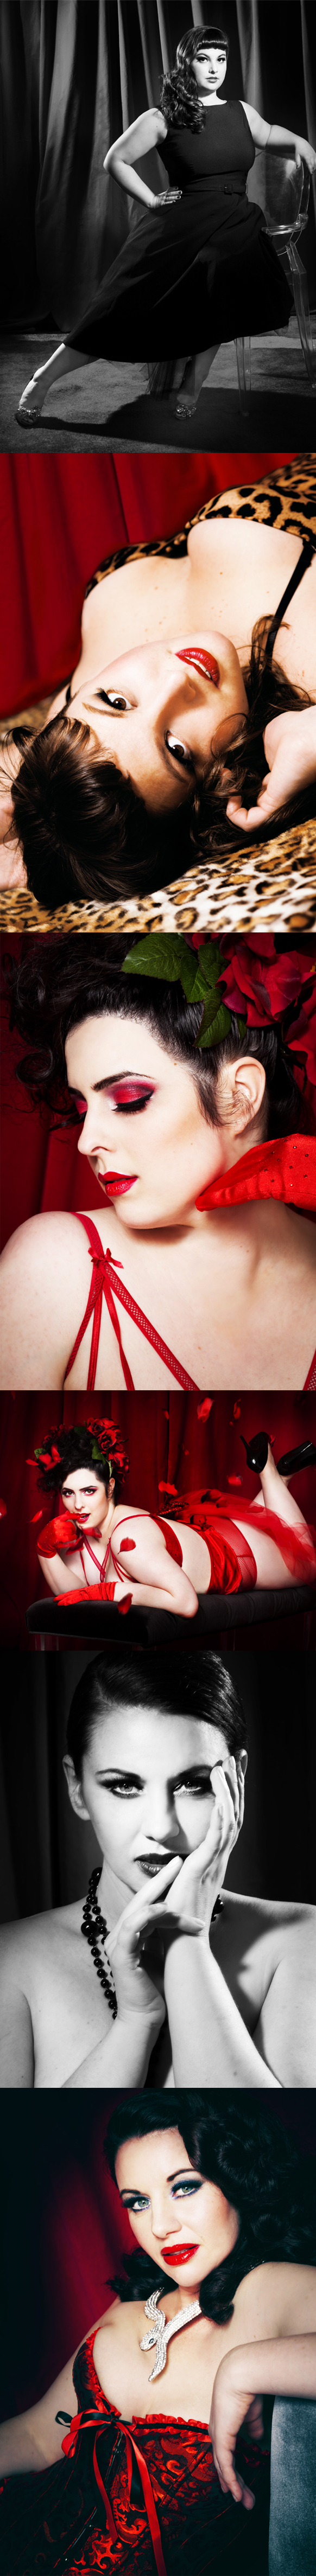 Burlesque, Montreal, Red Room, Leopard Print, Pin-Up, Film Noir